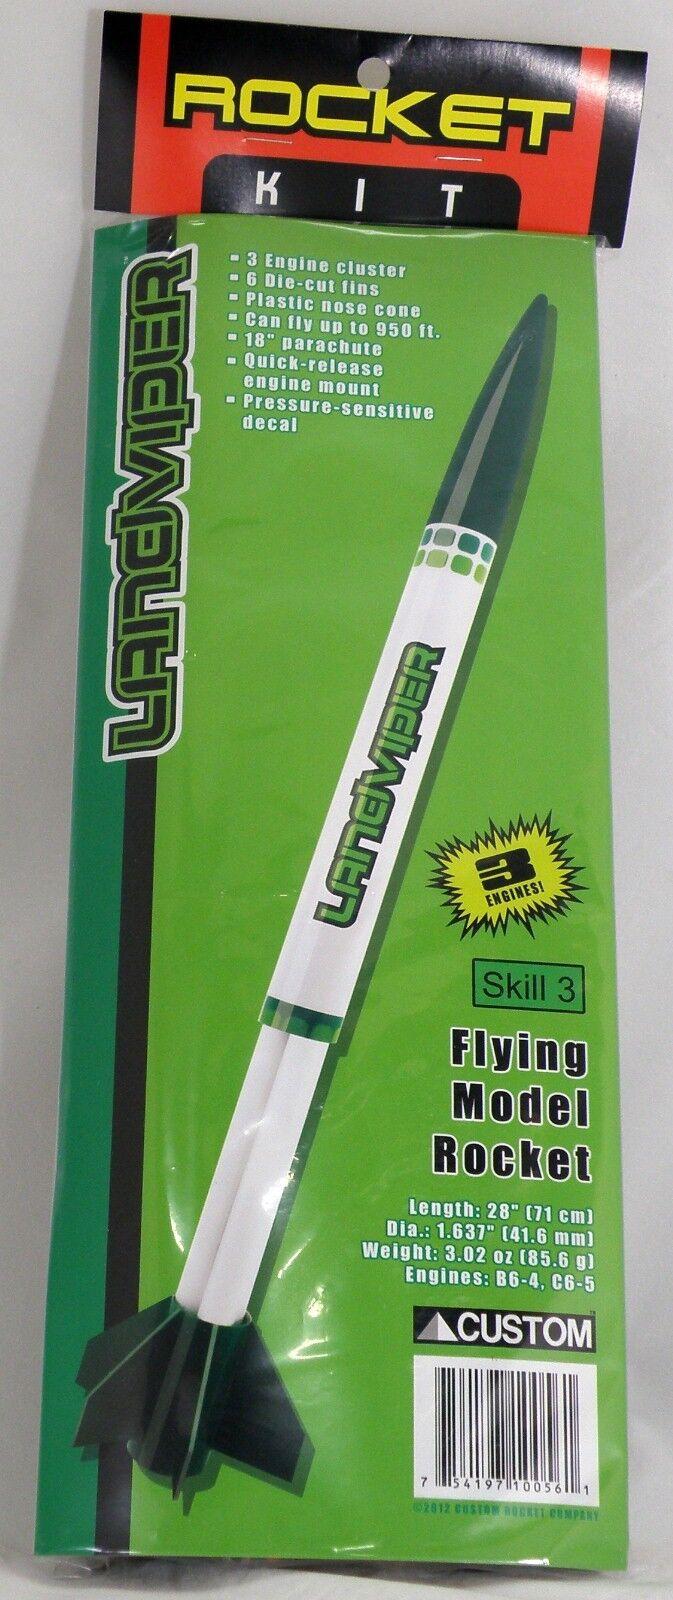 Landviper Model Rocket Kit - Skill Level 3 - Custom Rocket Company Toys